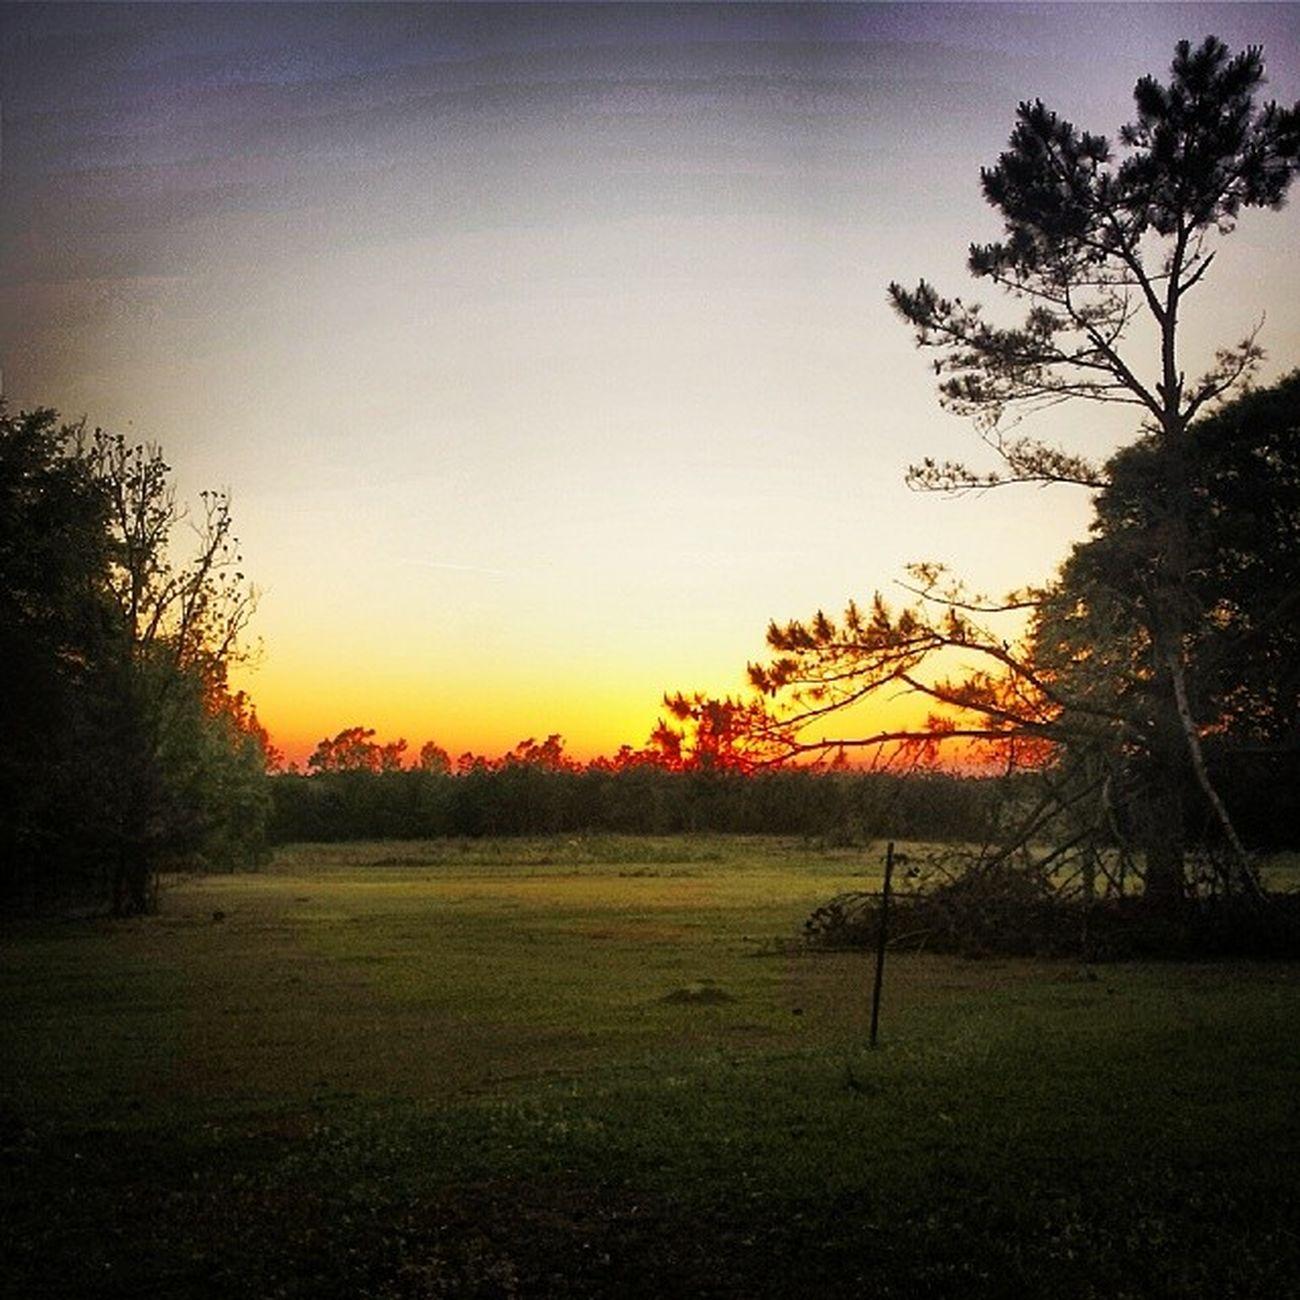 Fire in the sky. Last sunset for me on Red Hill for a little bit. Good night, moon. GA Ruralgeorgia Harrisonga Sun sunset vscocam vscopictures vscogood vsco instagood photooftheday ig_treasures iggeorgia goodnight goodtimes family